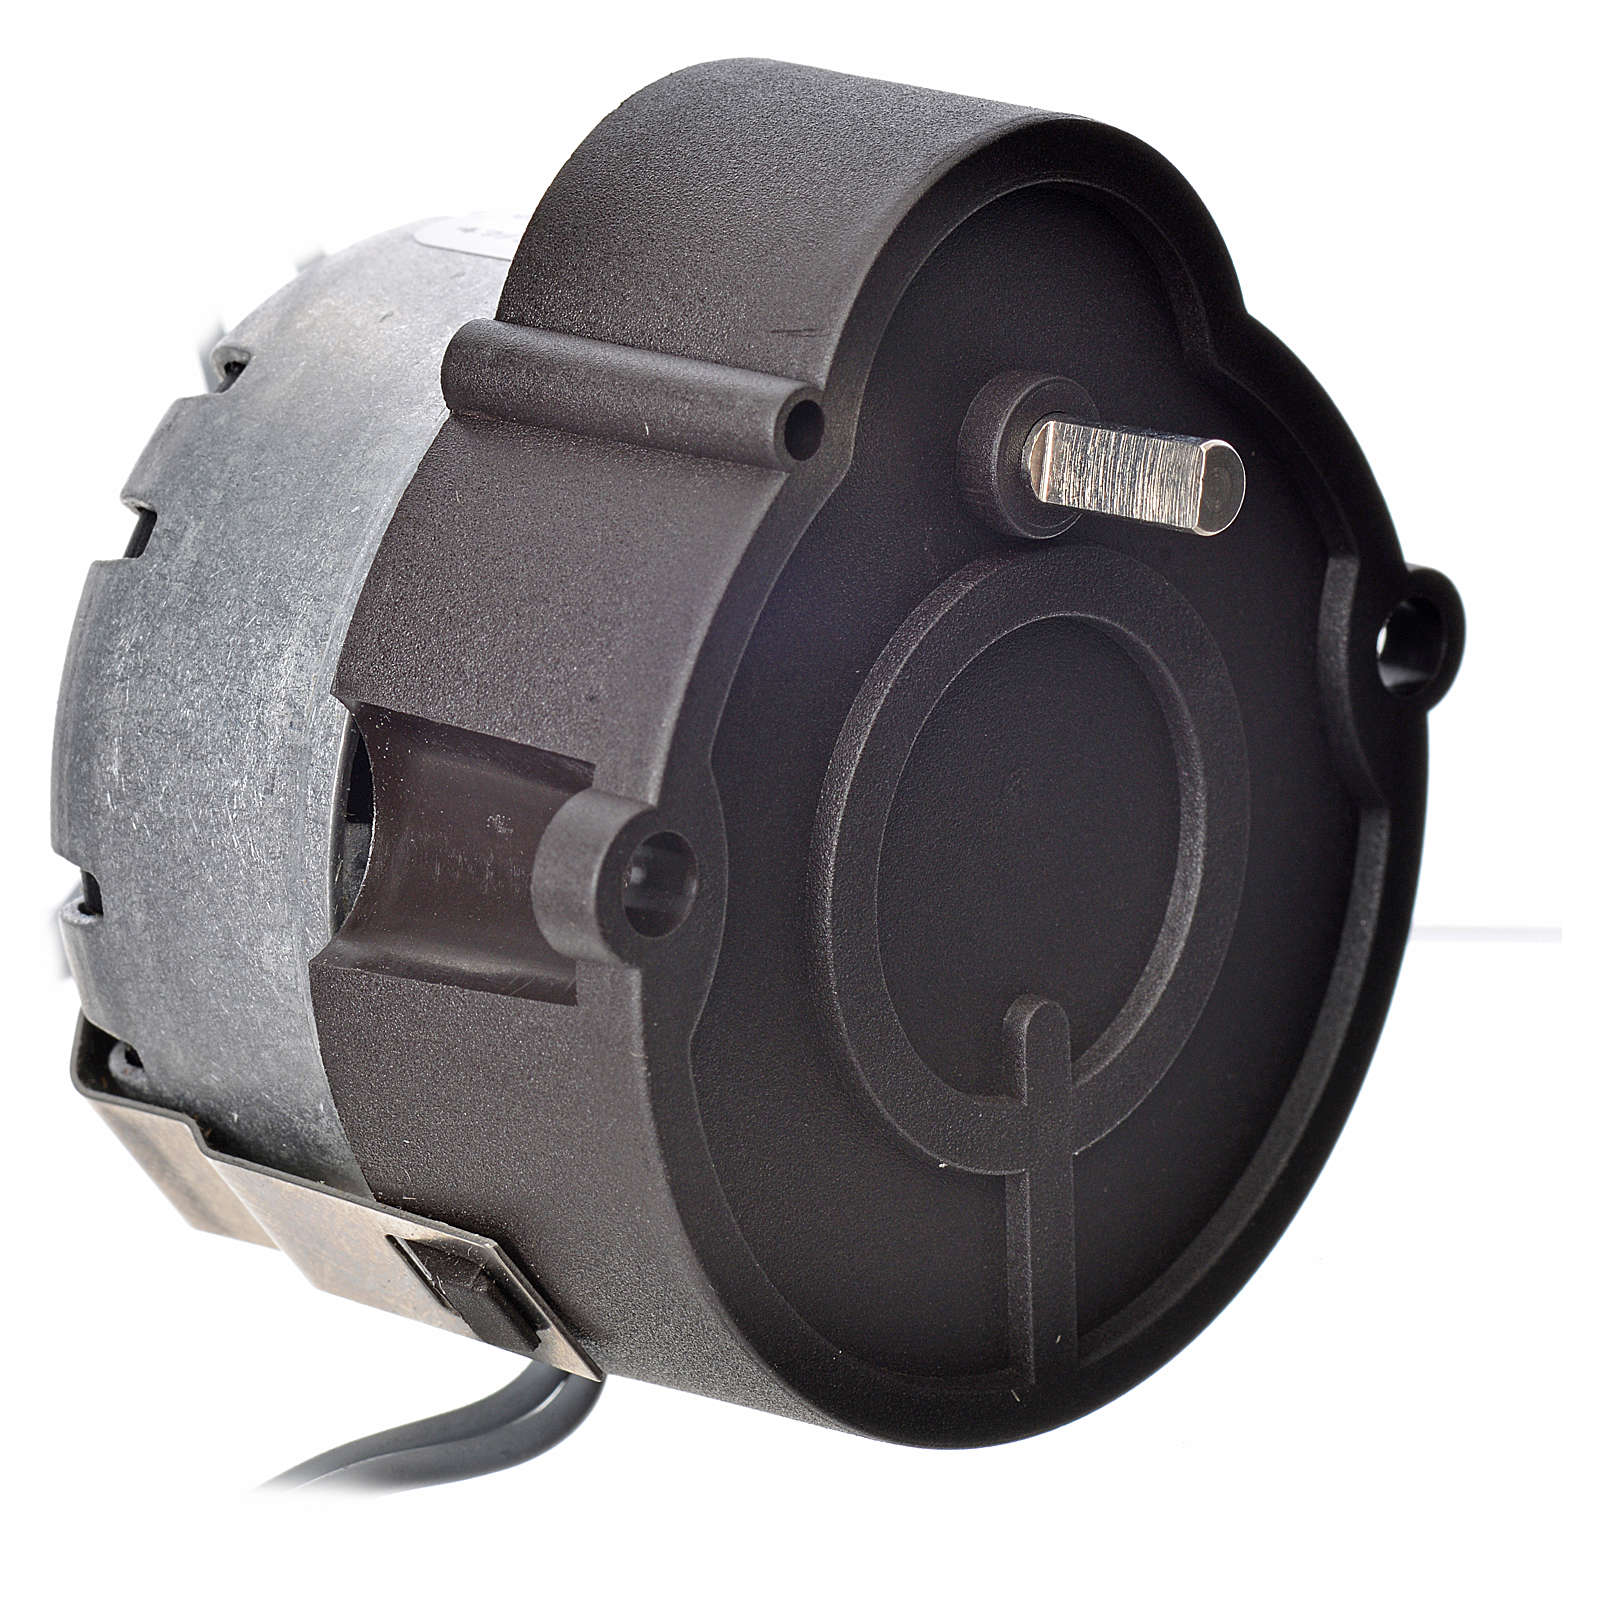 Motoriduttore presepe  MR giri/minuto 20 4